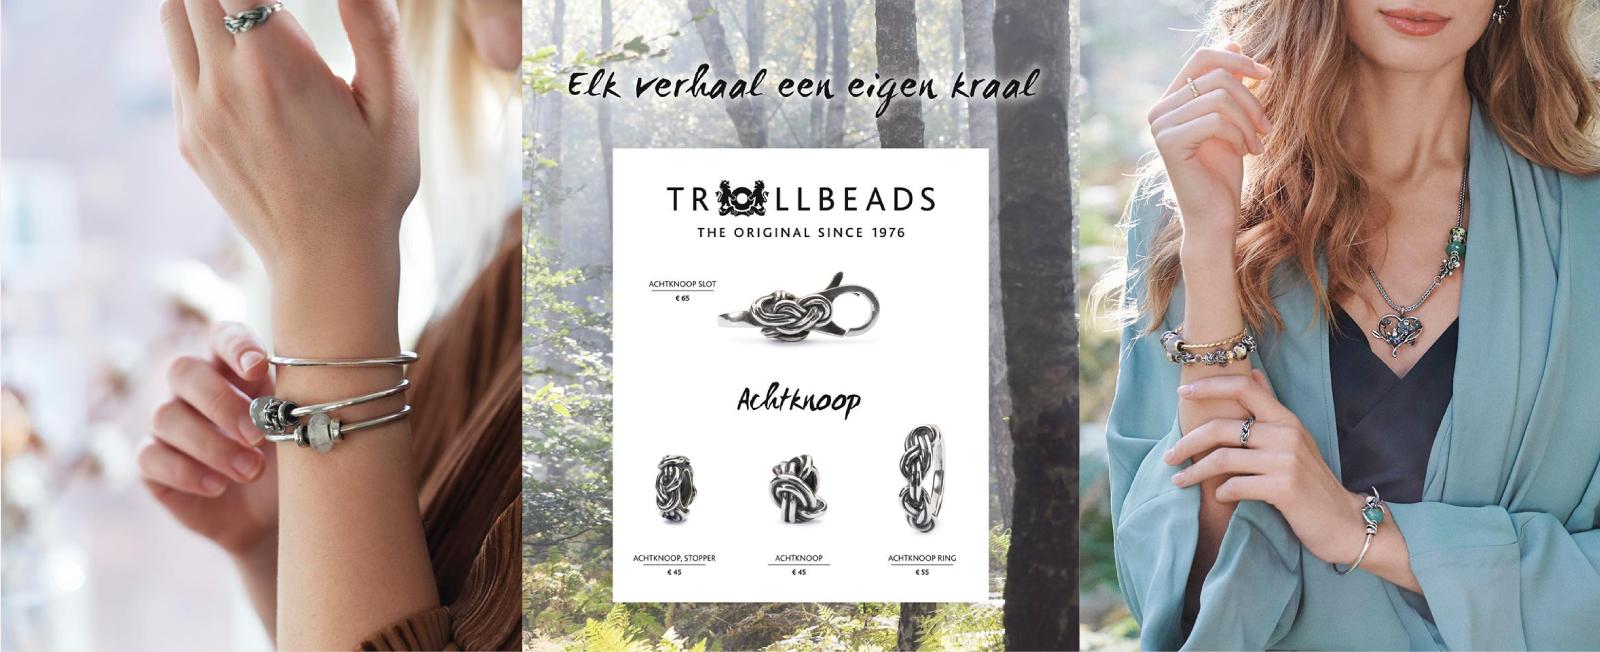 Trollbeads-stardust-wintercollectie-sieraden-bij-Wolters-Juweliers-Coevorden-Emmen